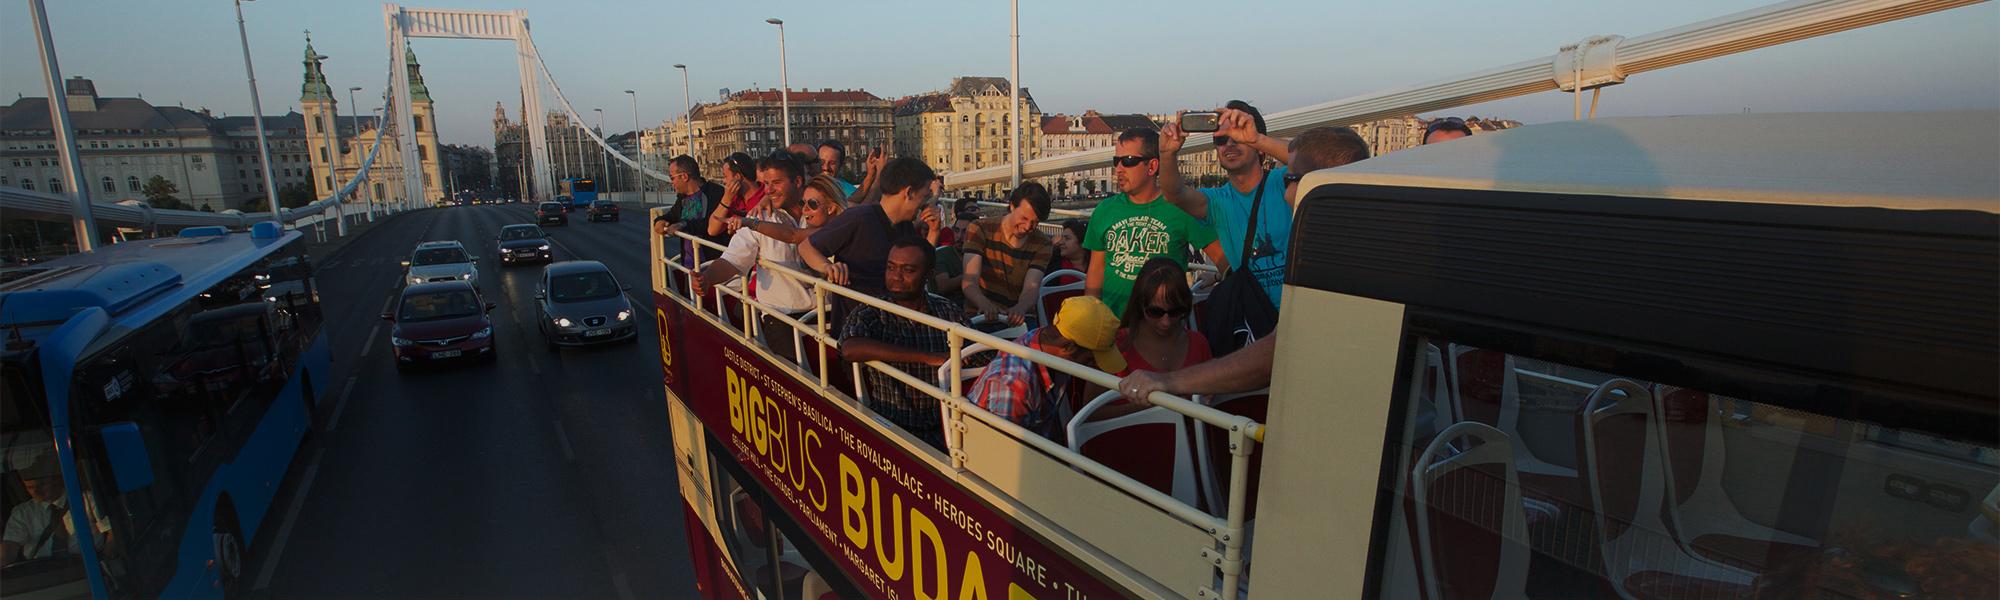 Utasok egy budapesti buszon